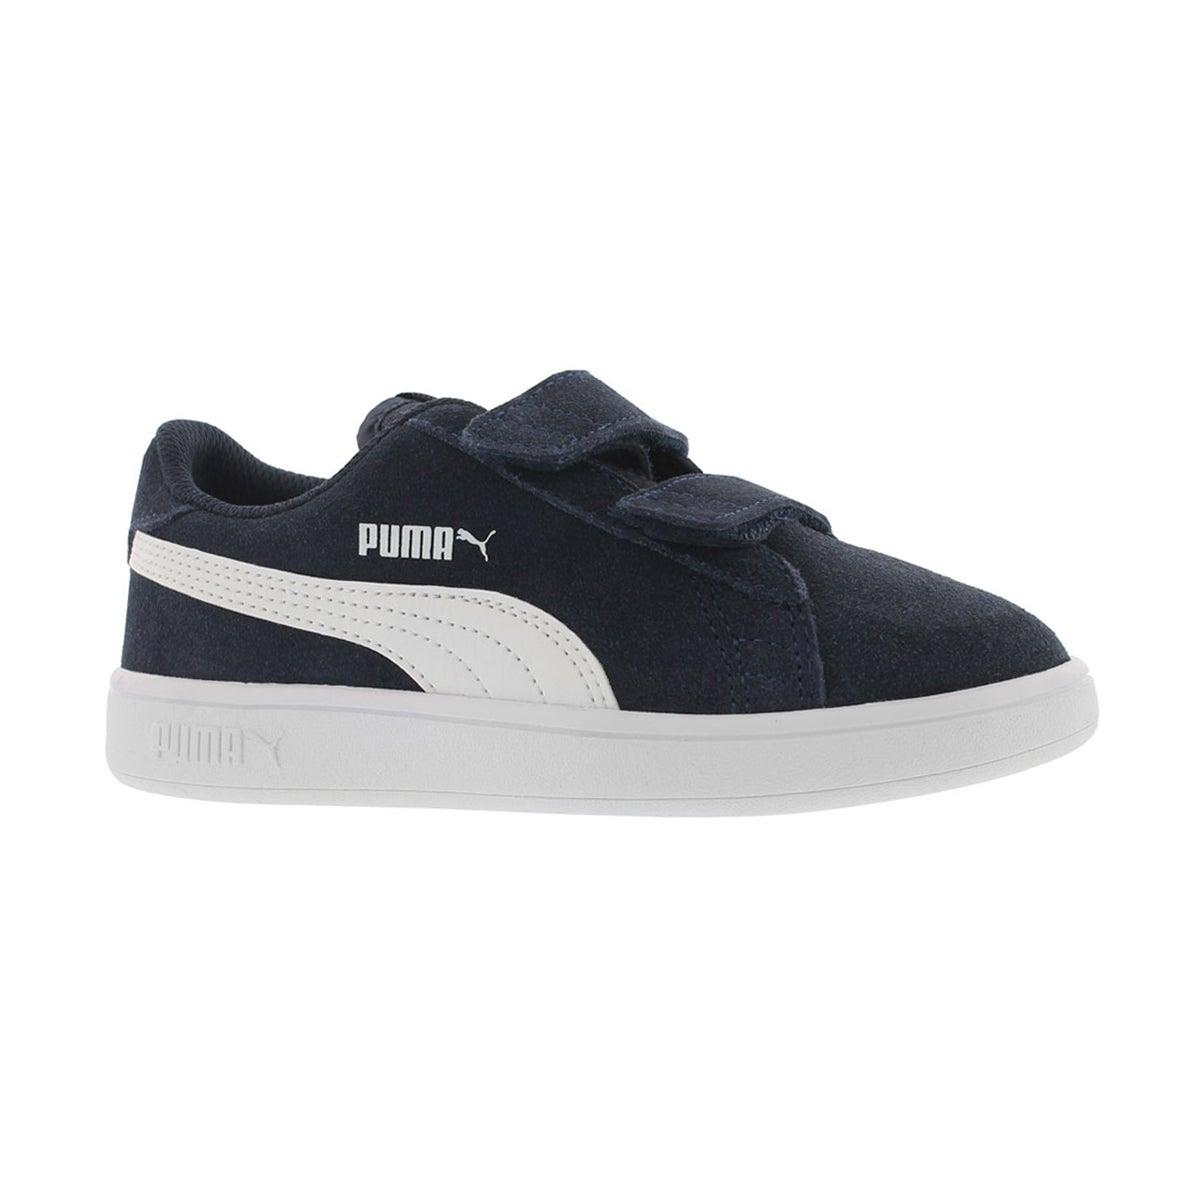 Boys' PUMA SMASH V2 peacoat sneakers